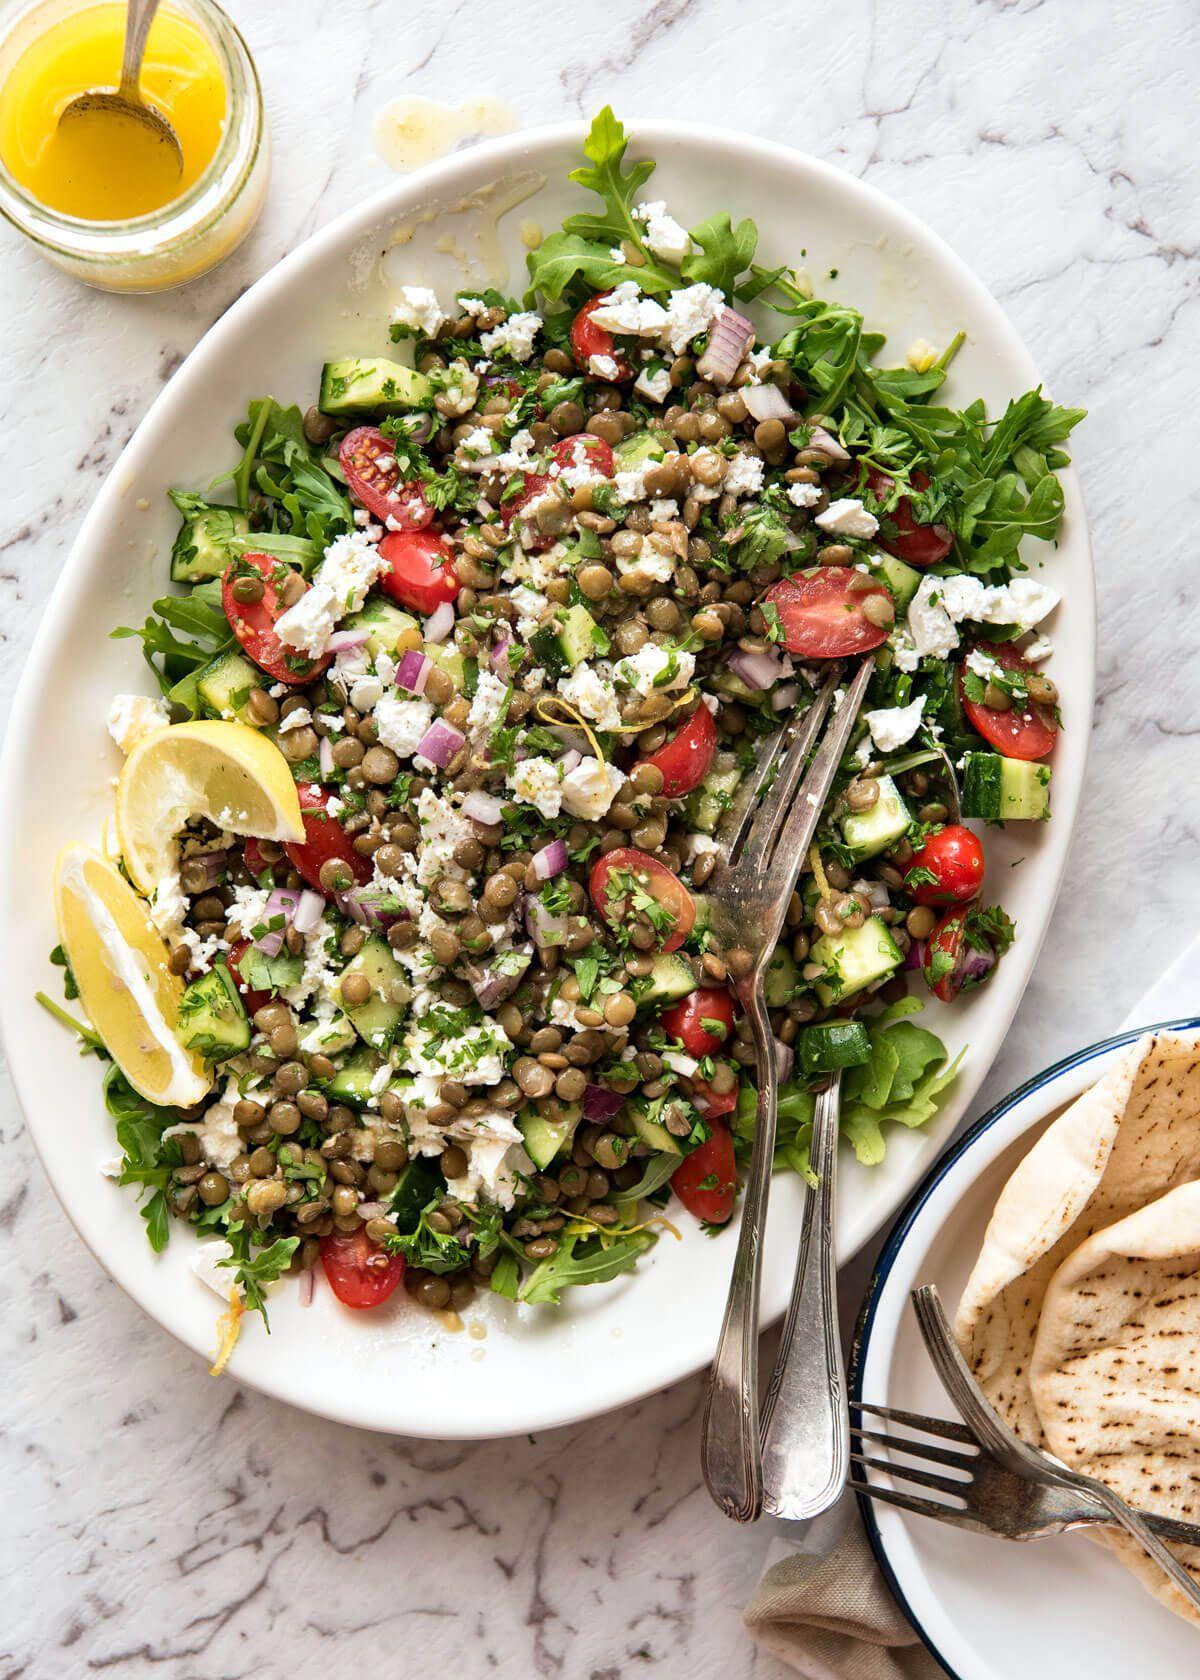 quinoa salad with lentils reciepe 22 day diet